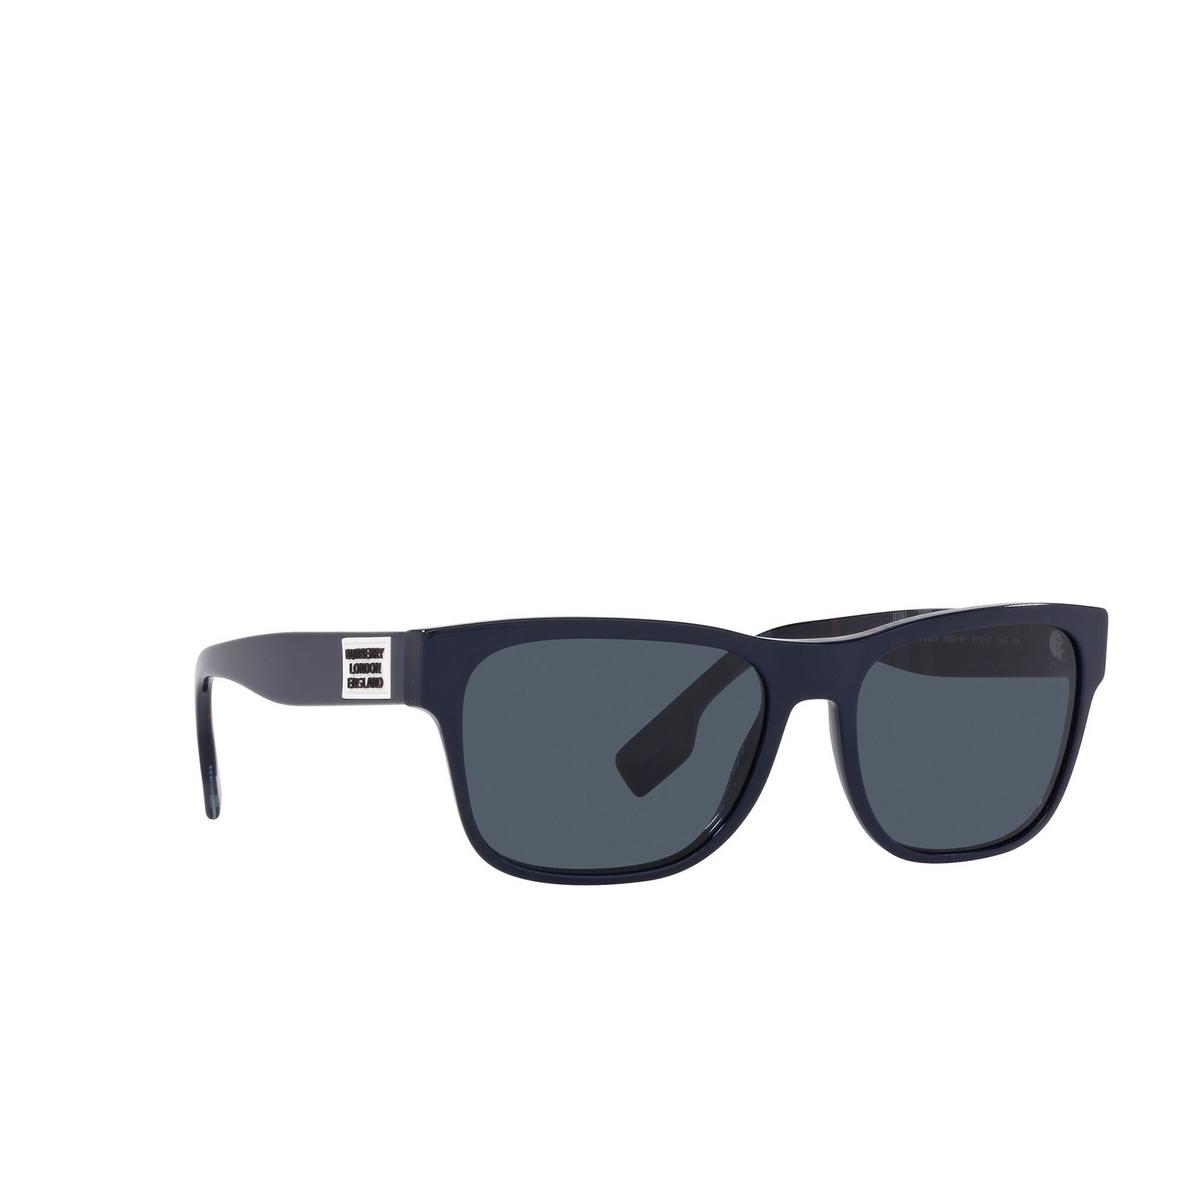 Burberry® Square Sunglasses: BE4309 color Matte Black 346487 - three-quarters view.